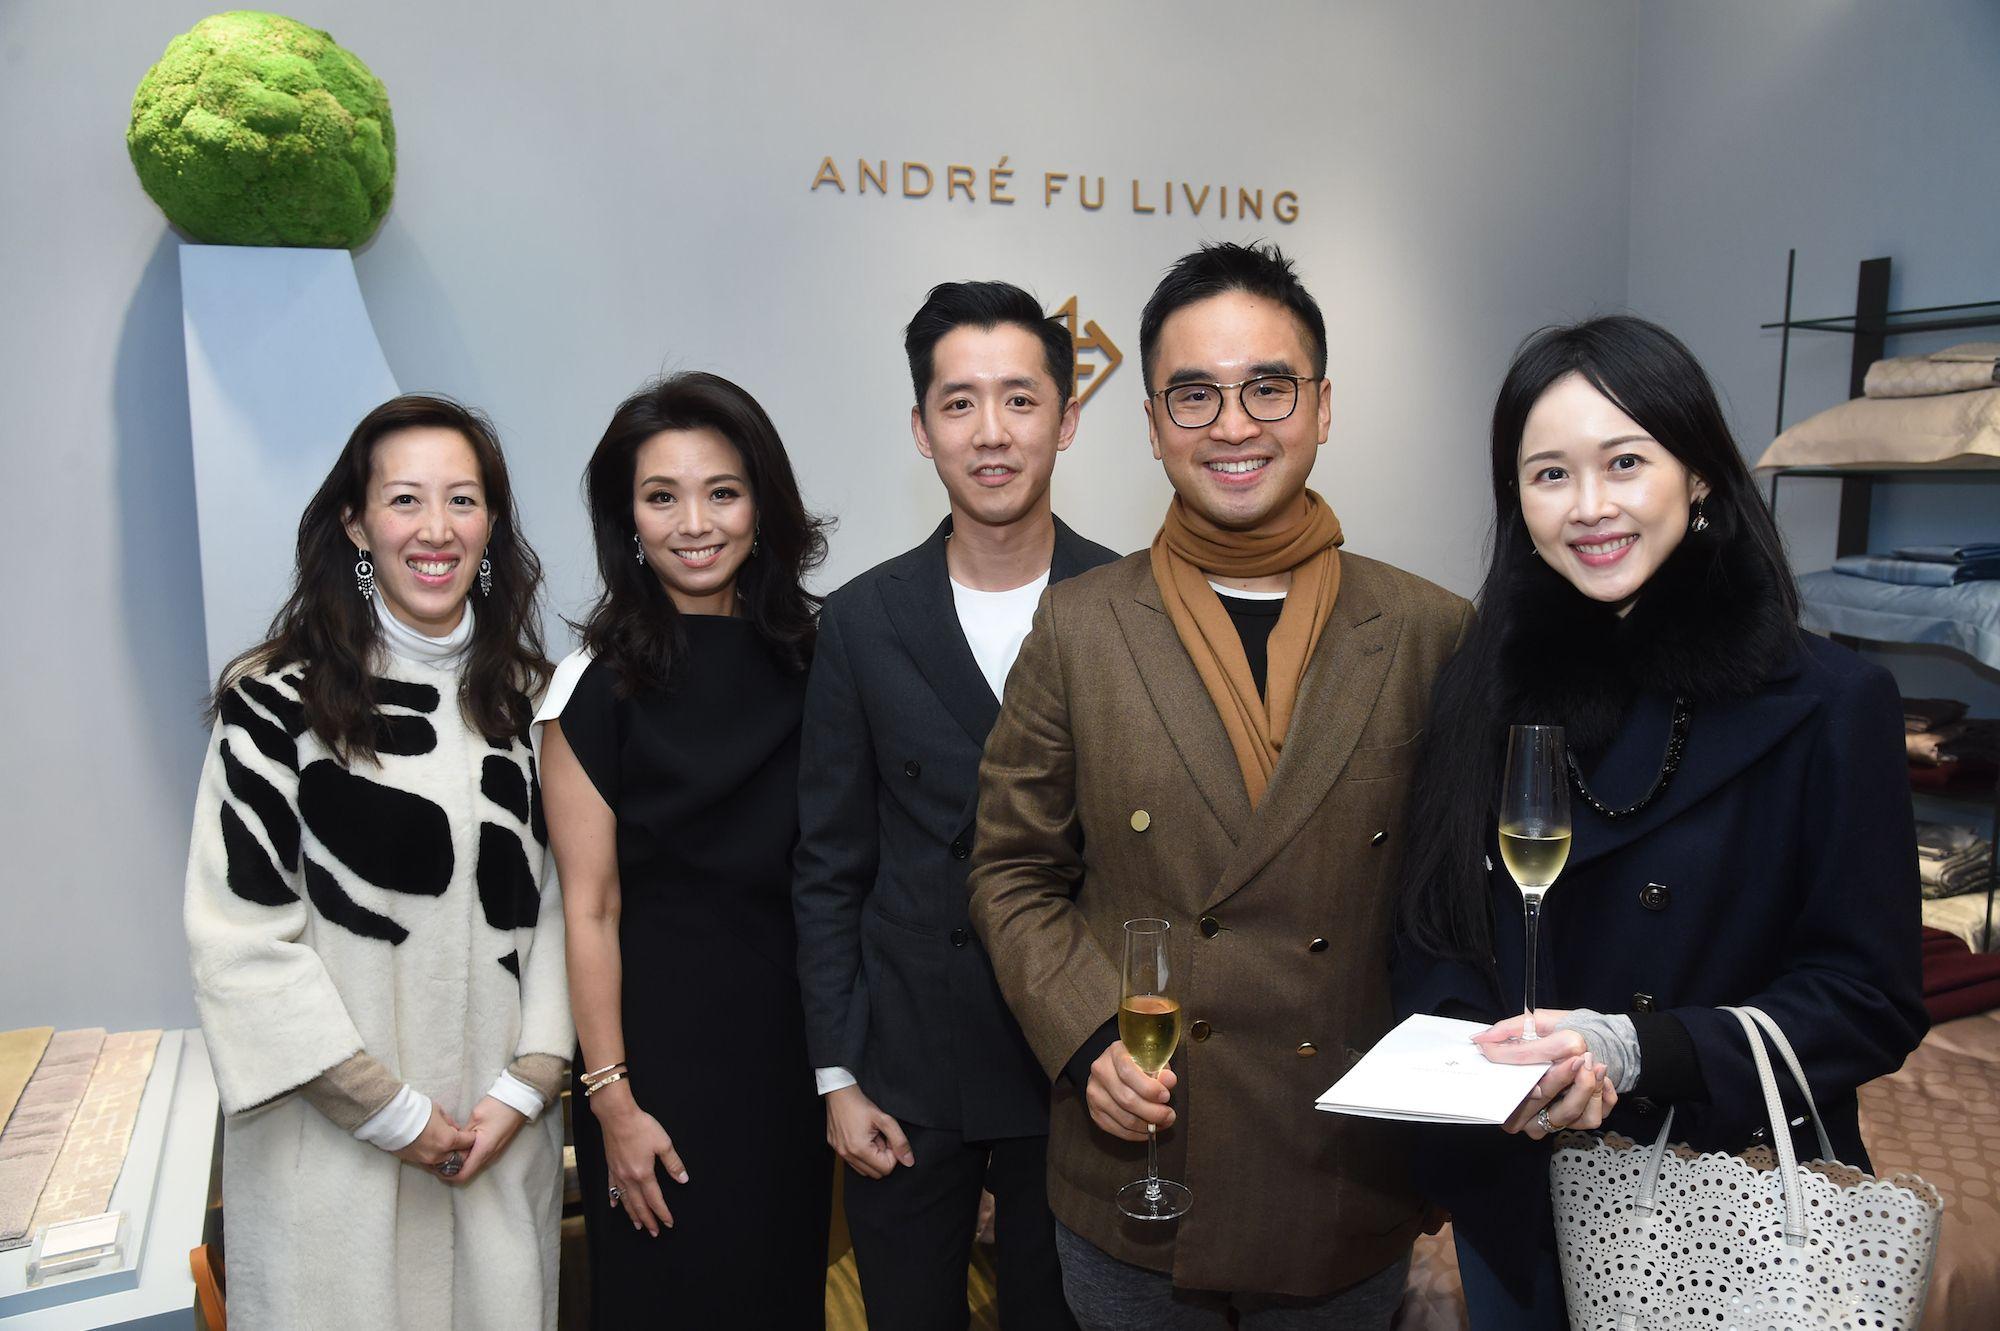 Nikki Ng, Anne Wang-Liu, André Fu, Adrian Cheng, Jacqueline Chow